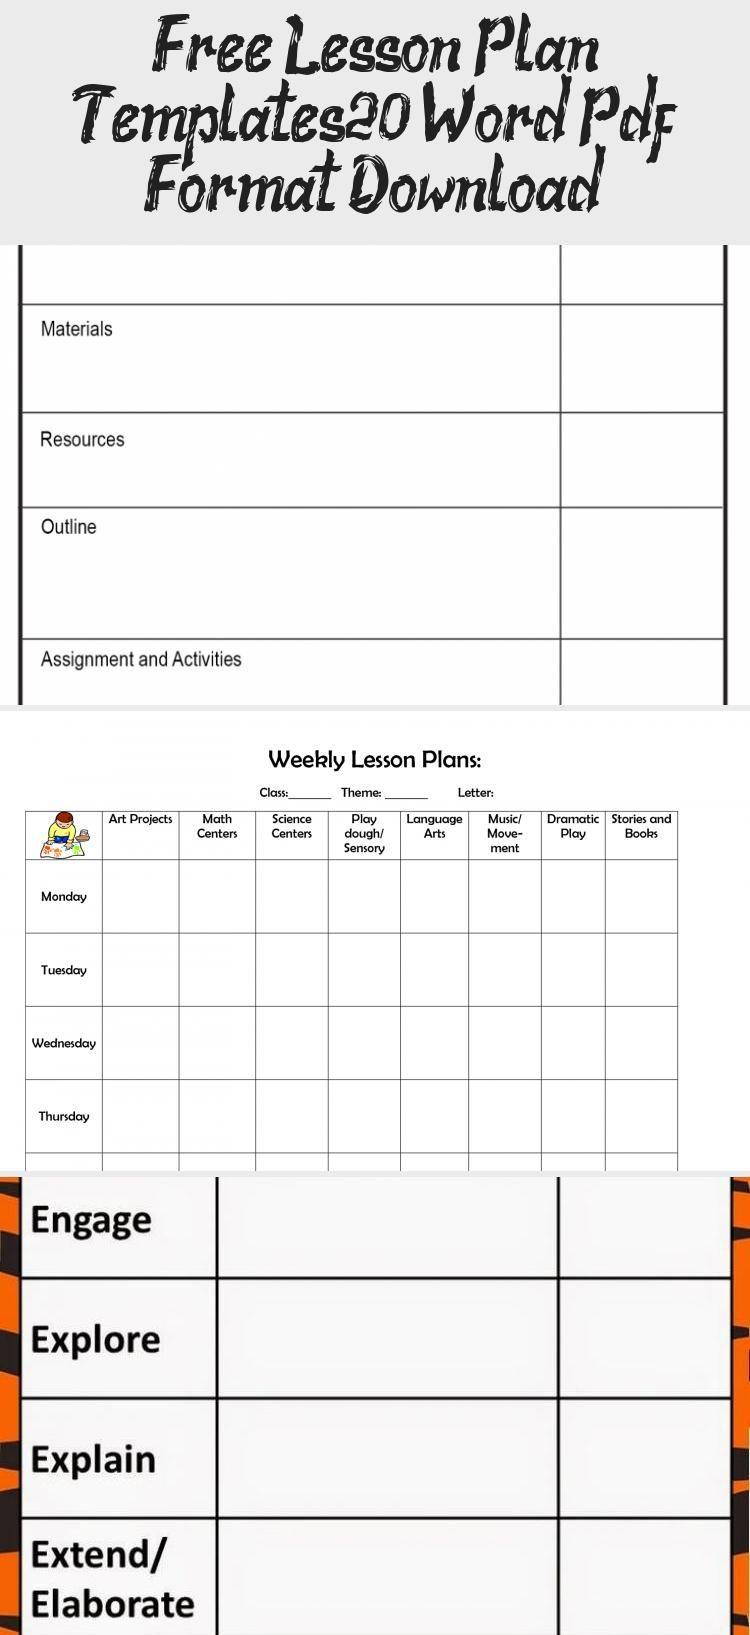 Free Lesson Plan Templates 20 Word Pdf Format Download Credit Score Lesson Plan Template Free Lesson Plan Templates Free Lesson Plans Lesson plan template free download